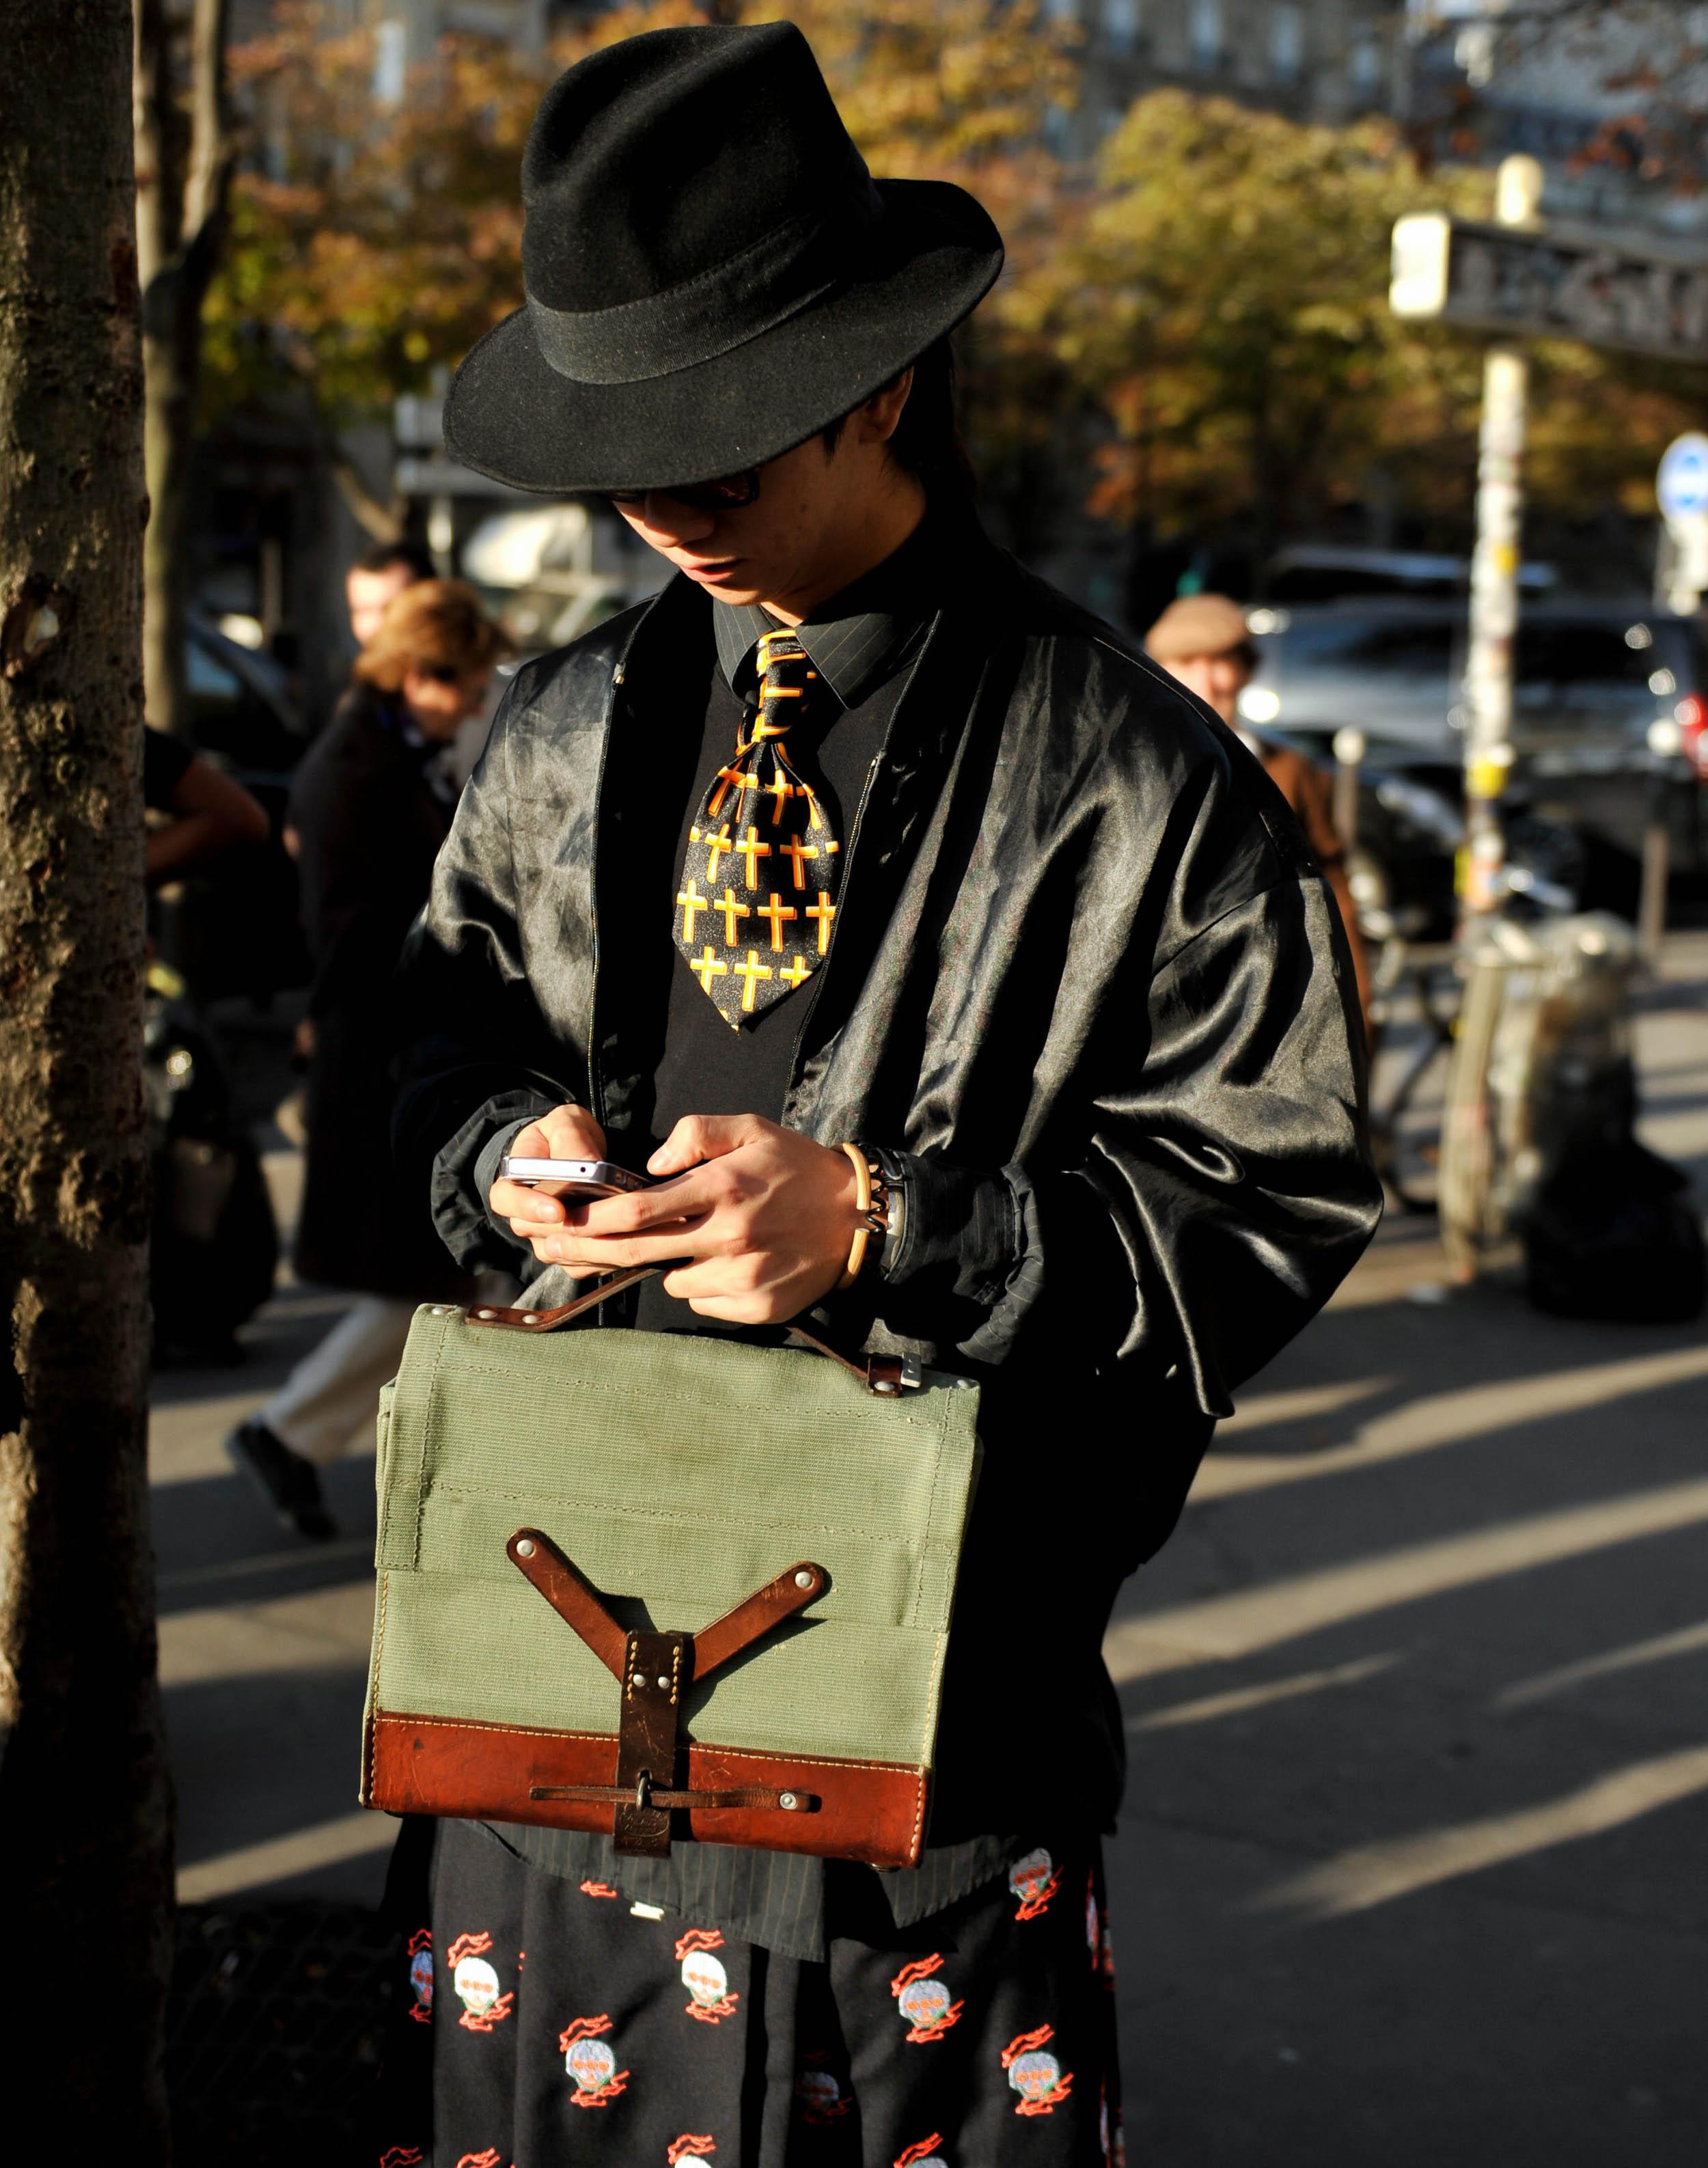 StreetStyle_ParisFashionWeek_LeandroJusten_082.jpg